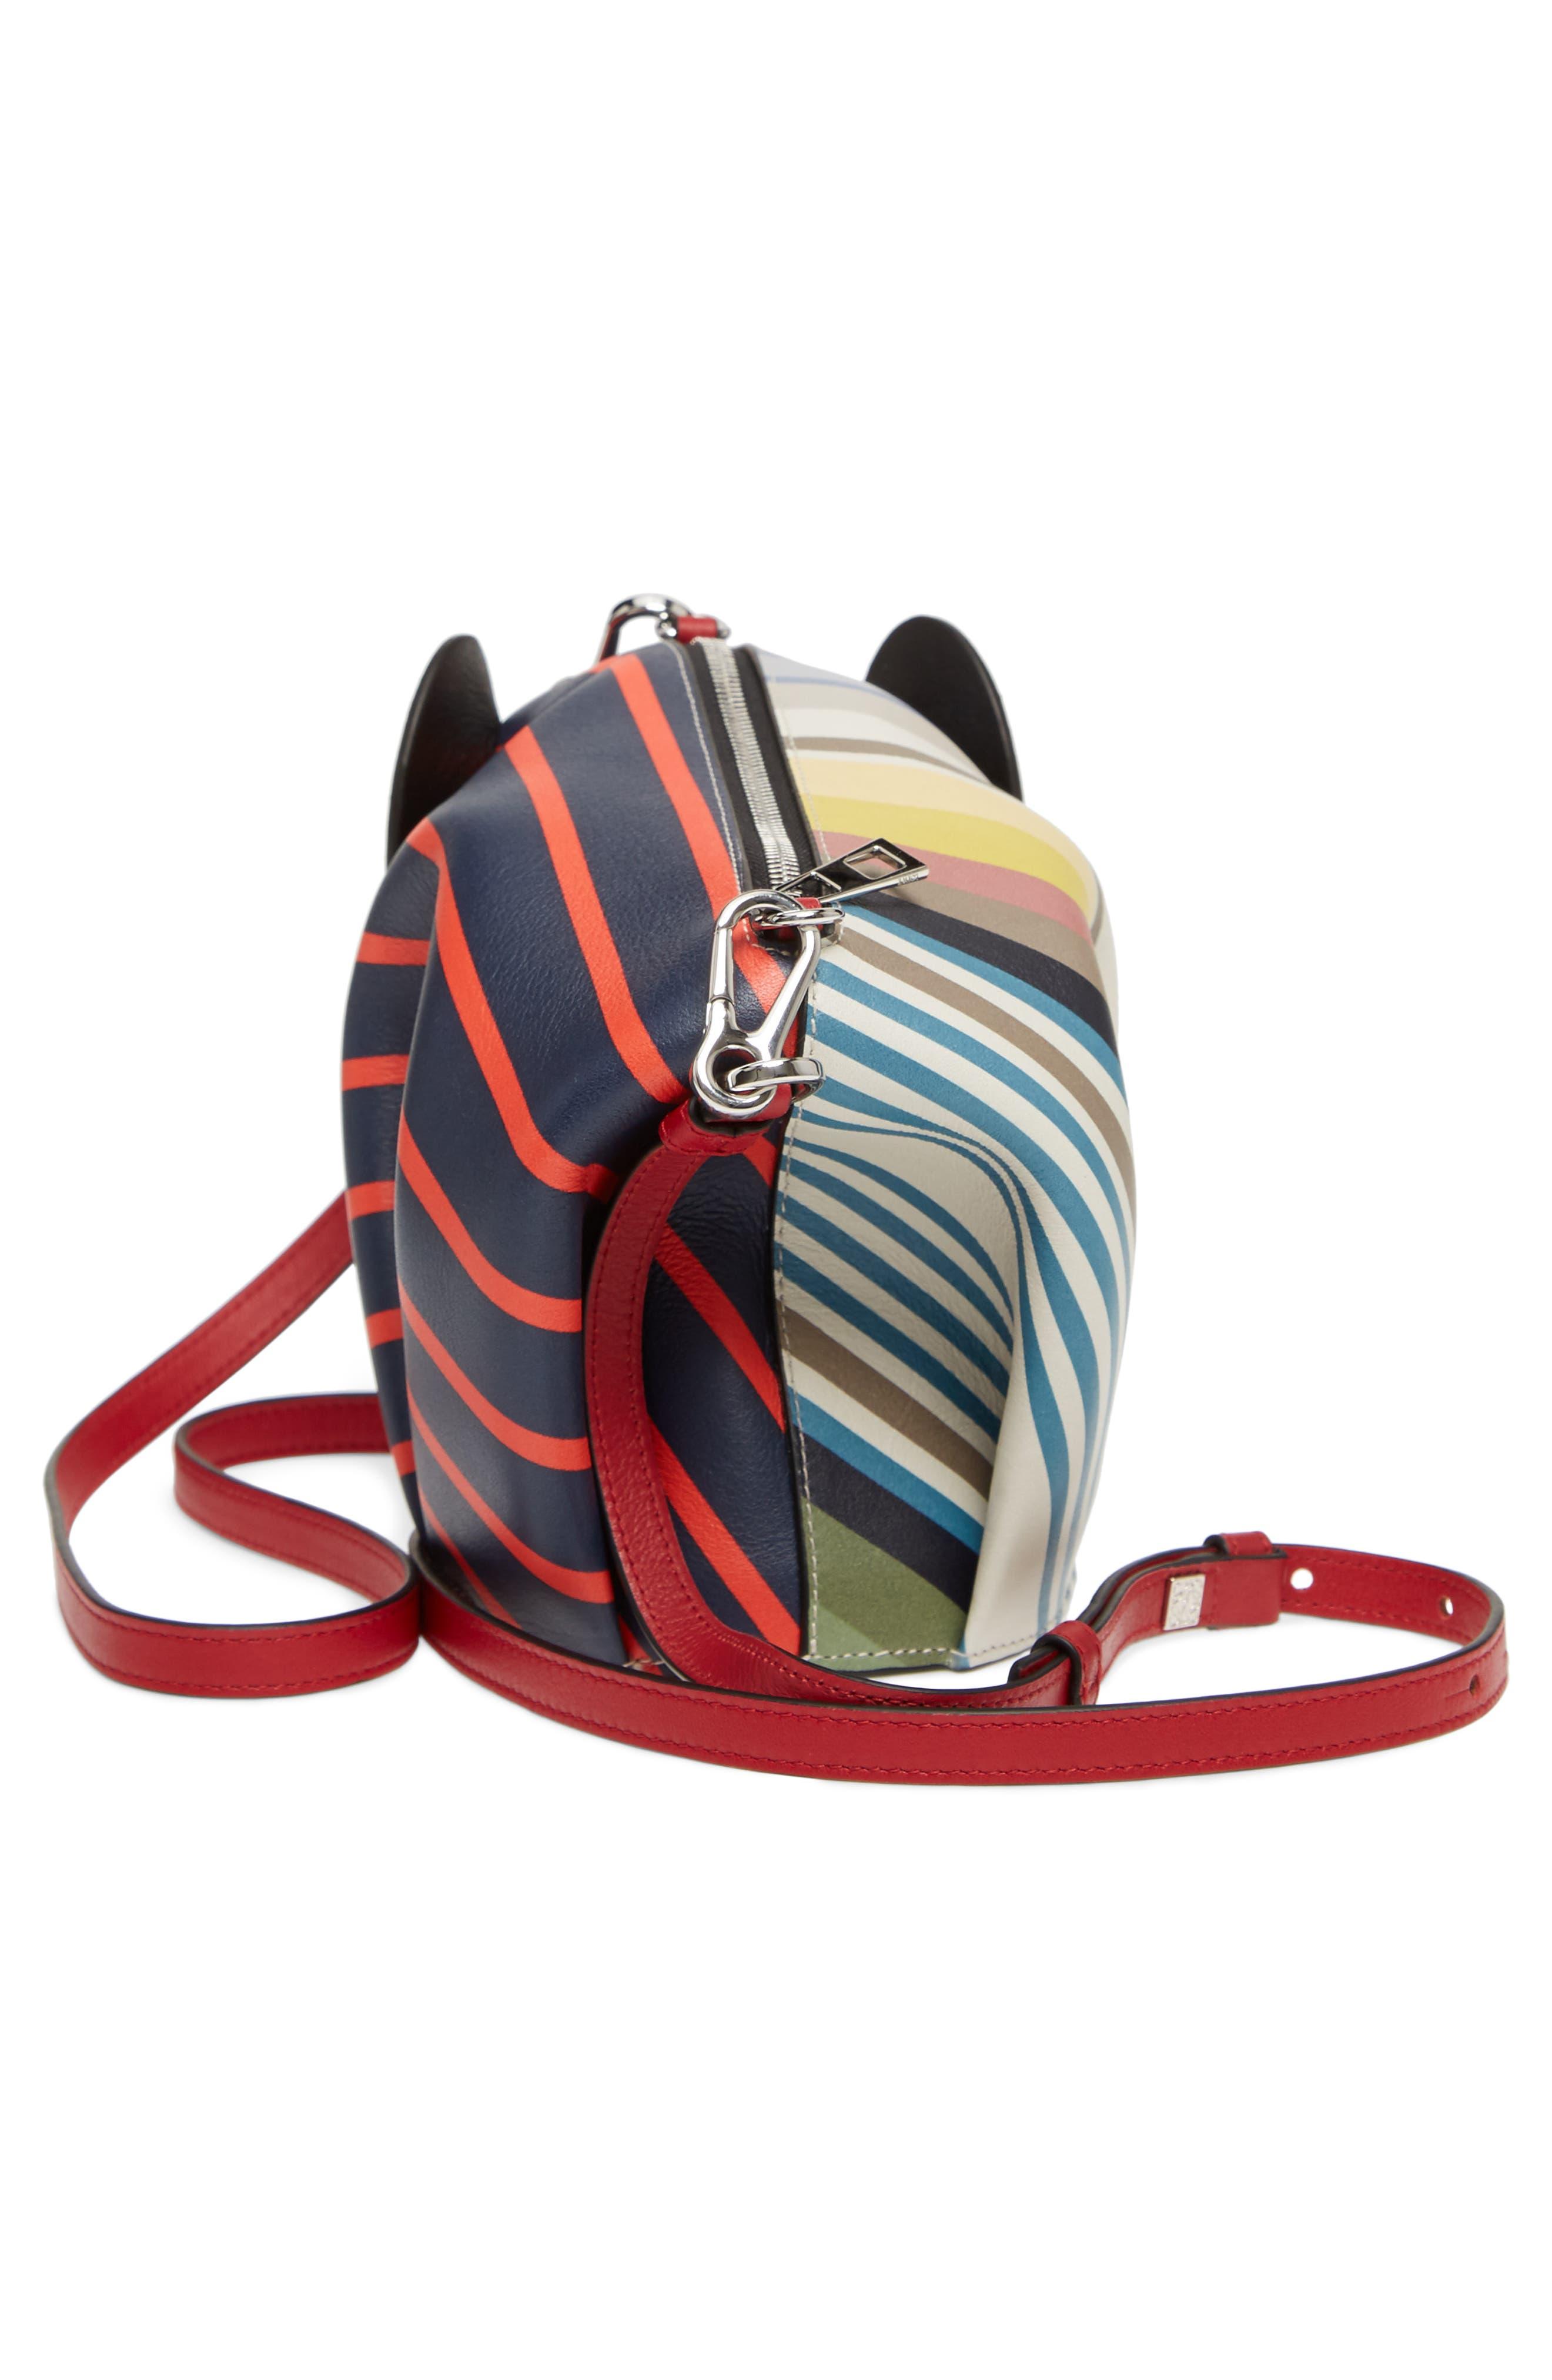 Mini Elephant Calfskin Leather Crossbody Bag,                             Alternate thumbnail 5, color,                             Multicolour